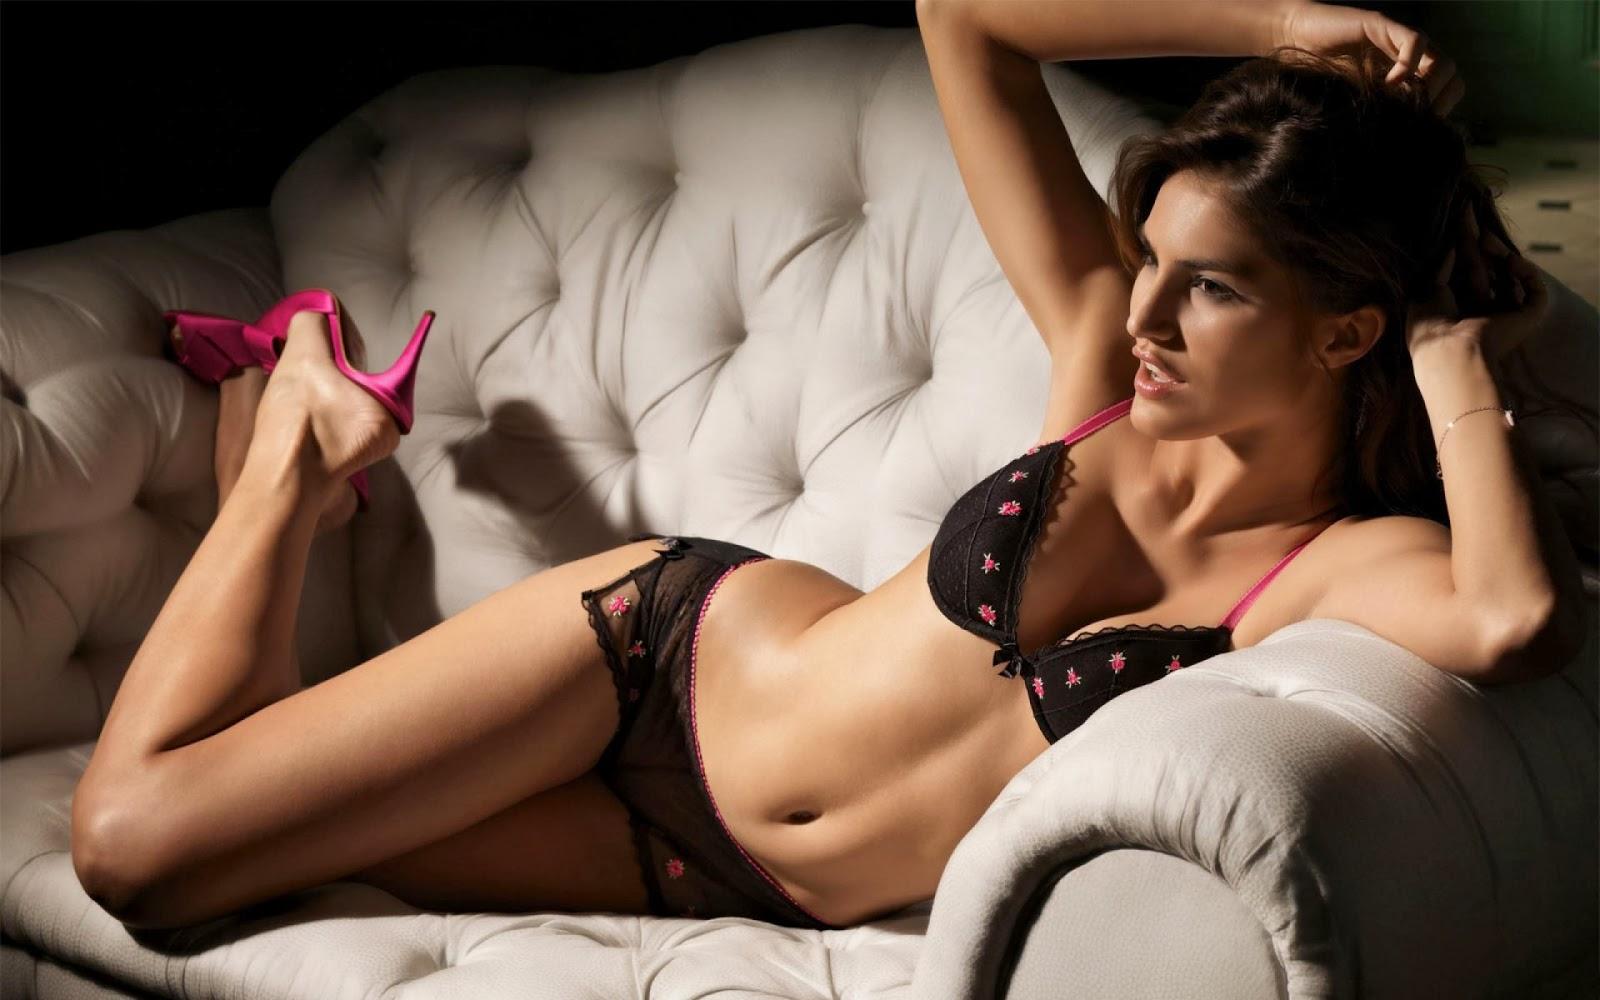 Cute Dog Stretching Wallpaper Juliana Martins New Bikini Hot Wallpaper 2014 All About